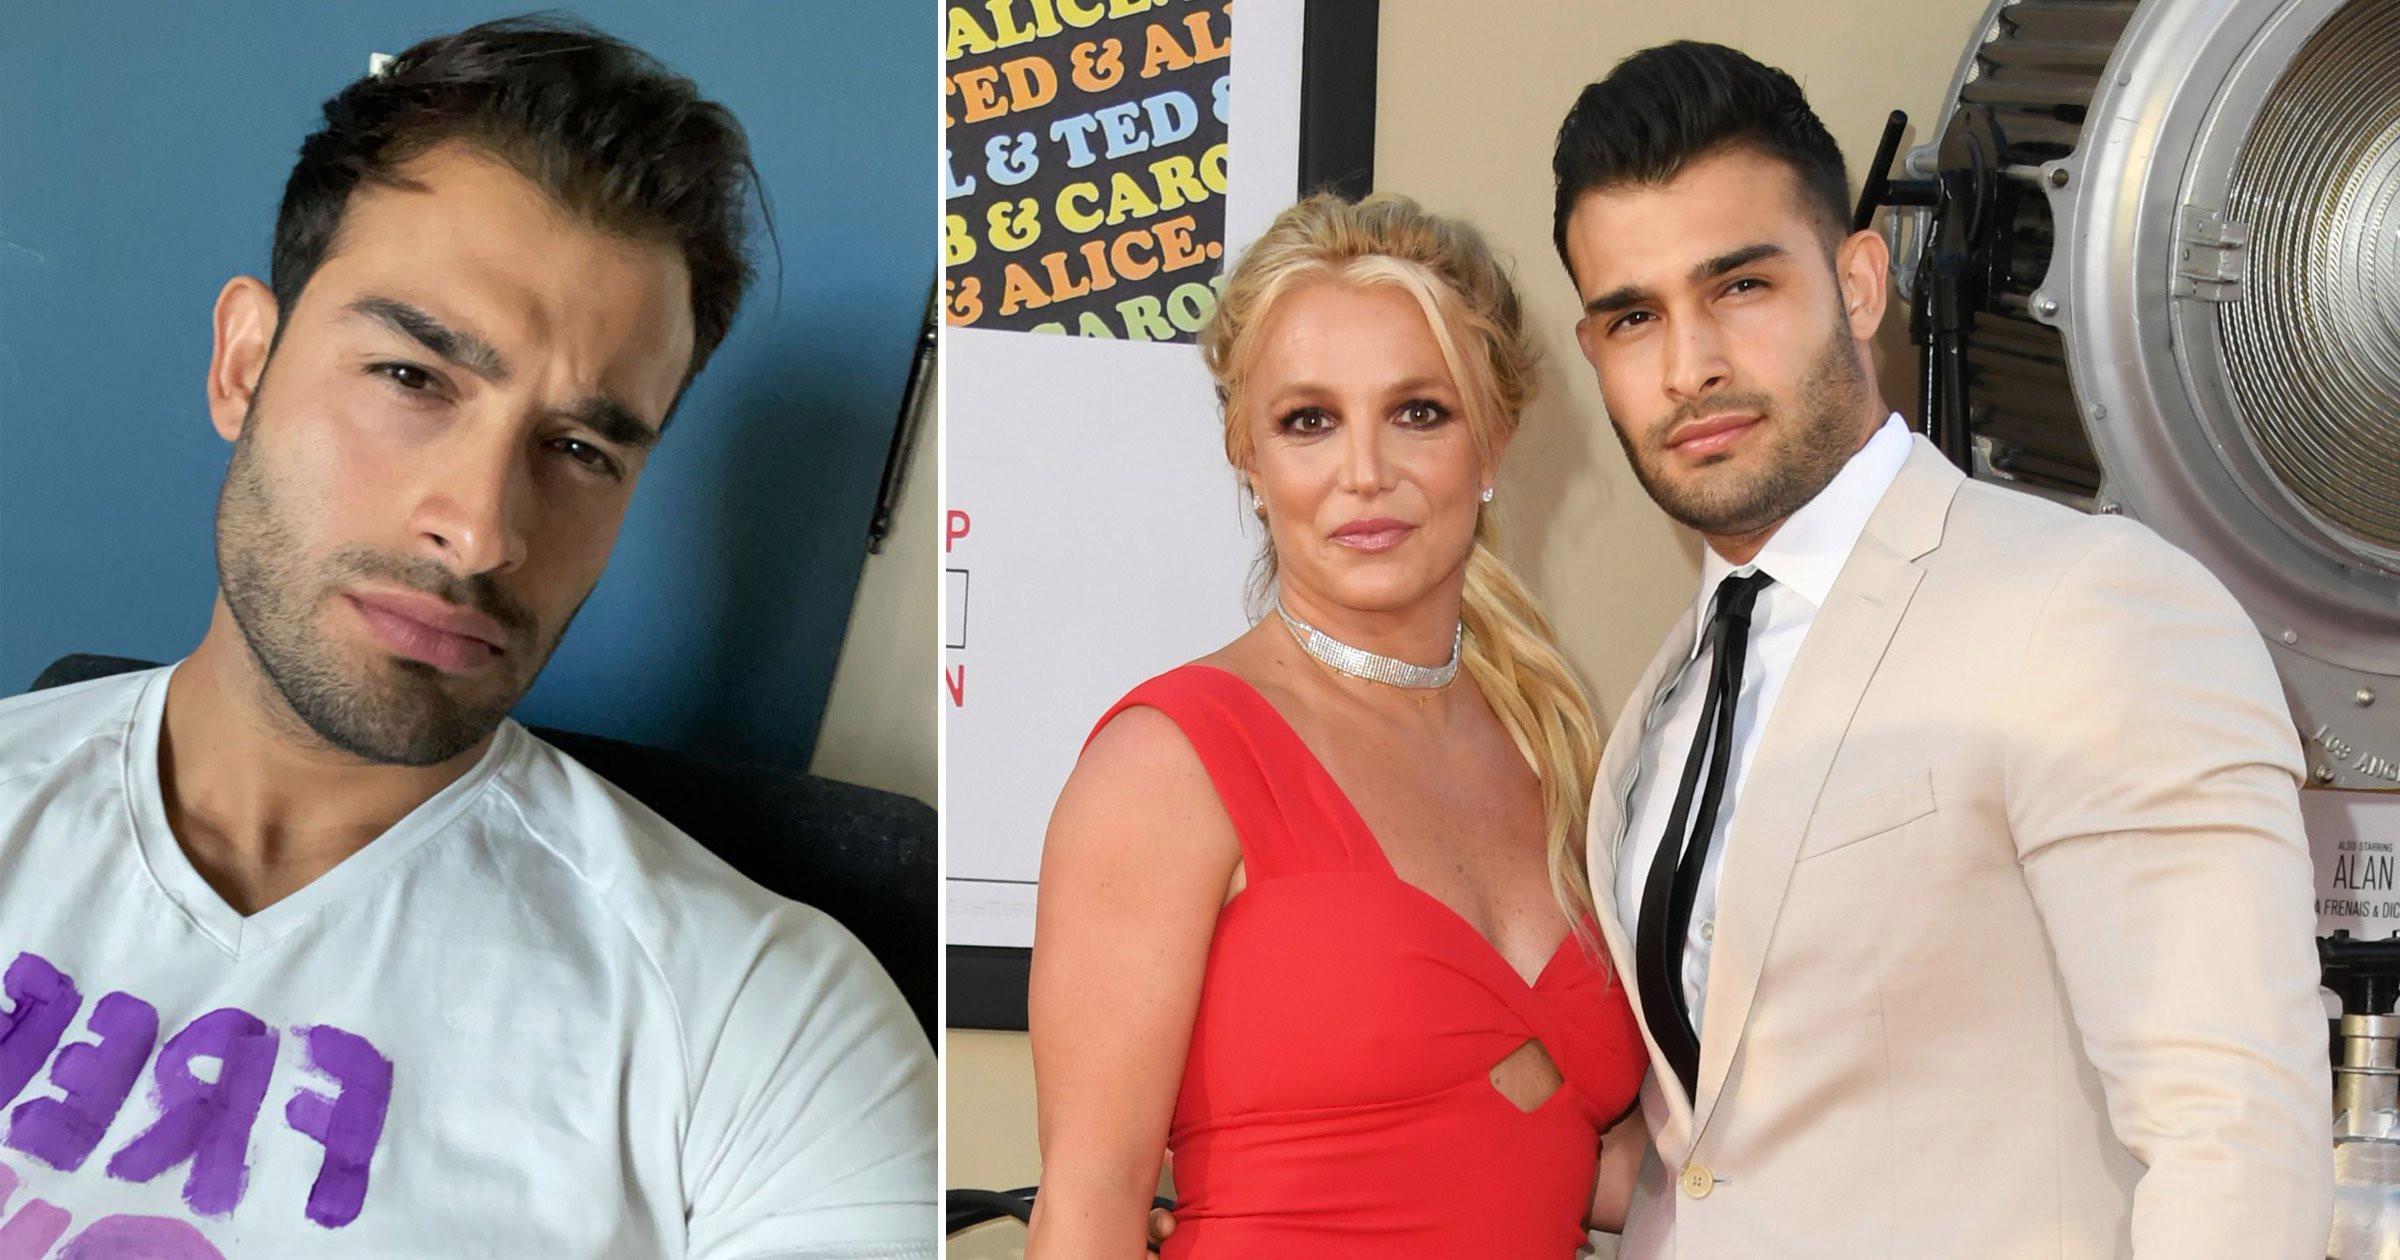 Britney Spears' boyfriend Sam Asghari wears #FreeBritney shirt ahead of conservatorship court hearing